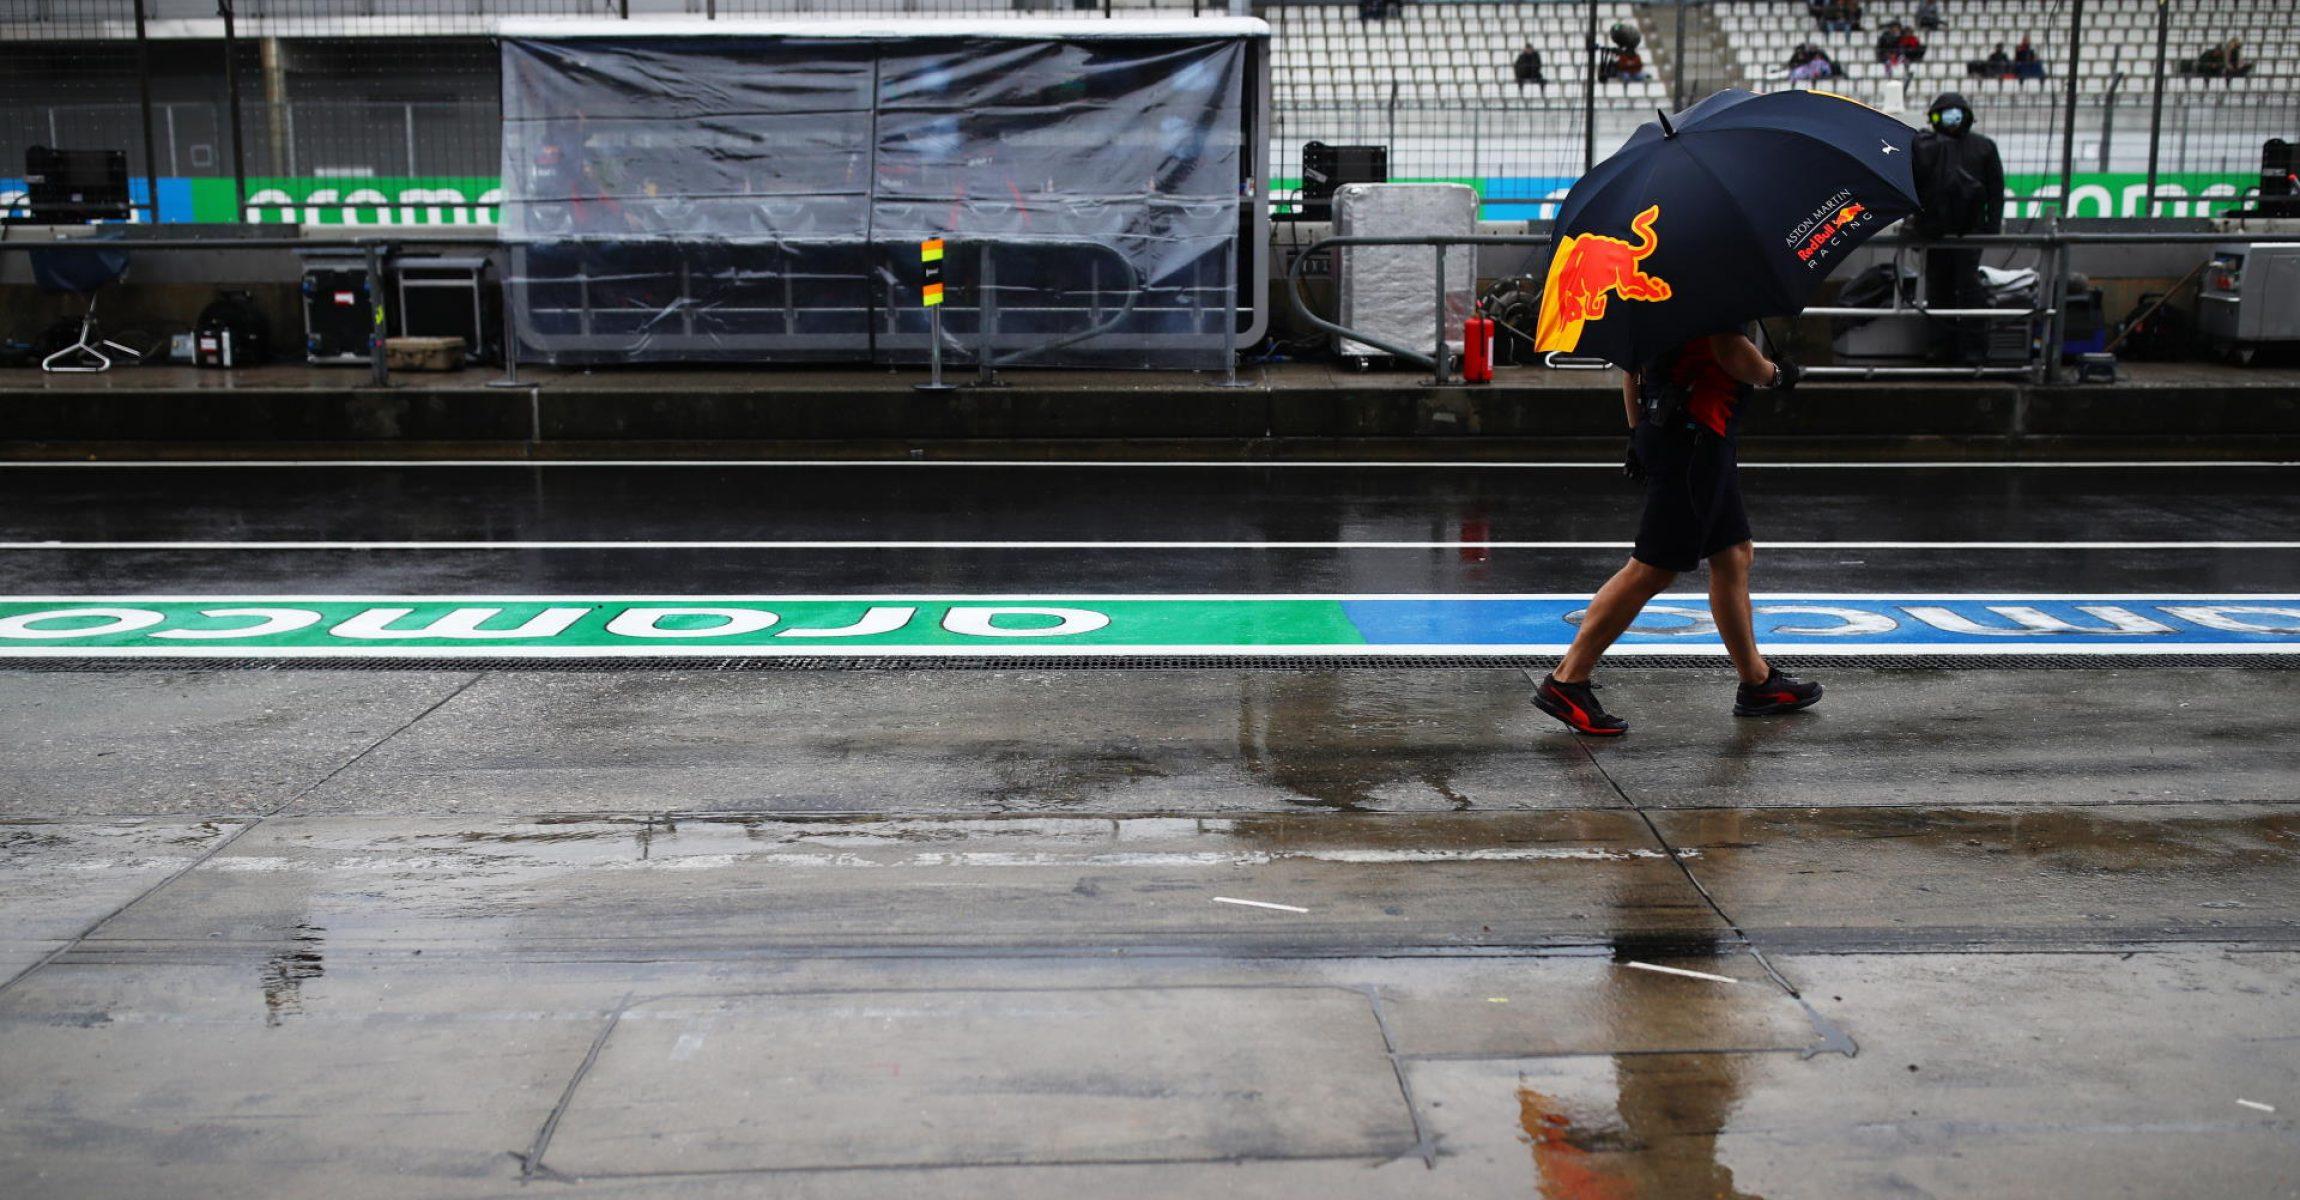 Nürburgring, pitlane, wet, racing, Red Bull umbrella